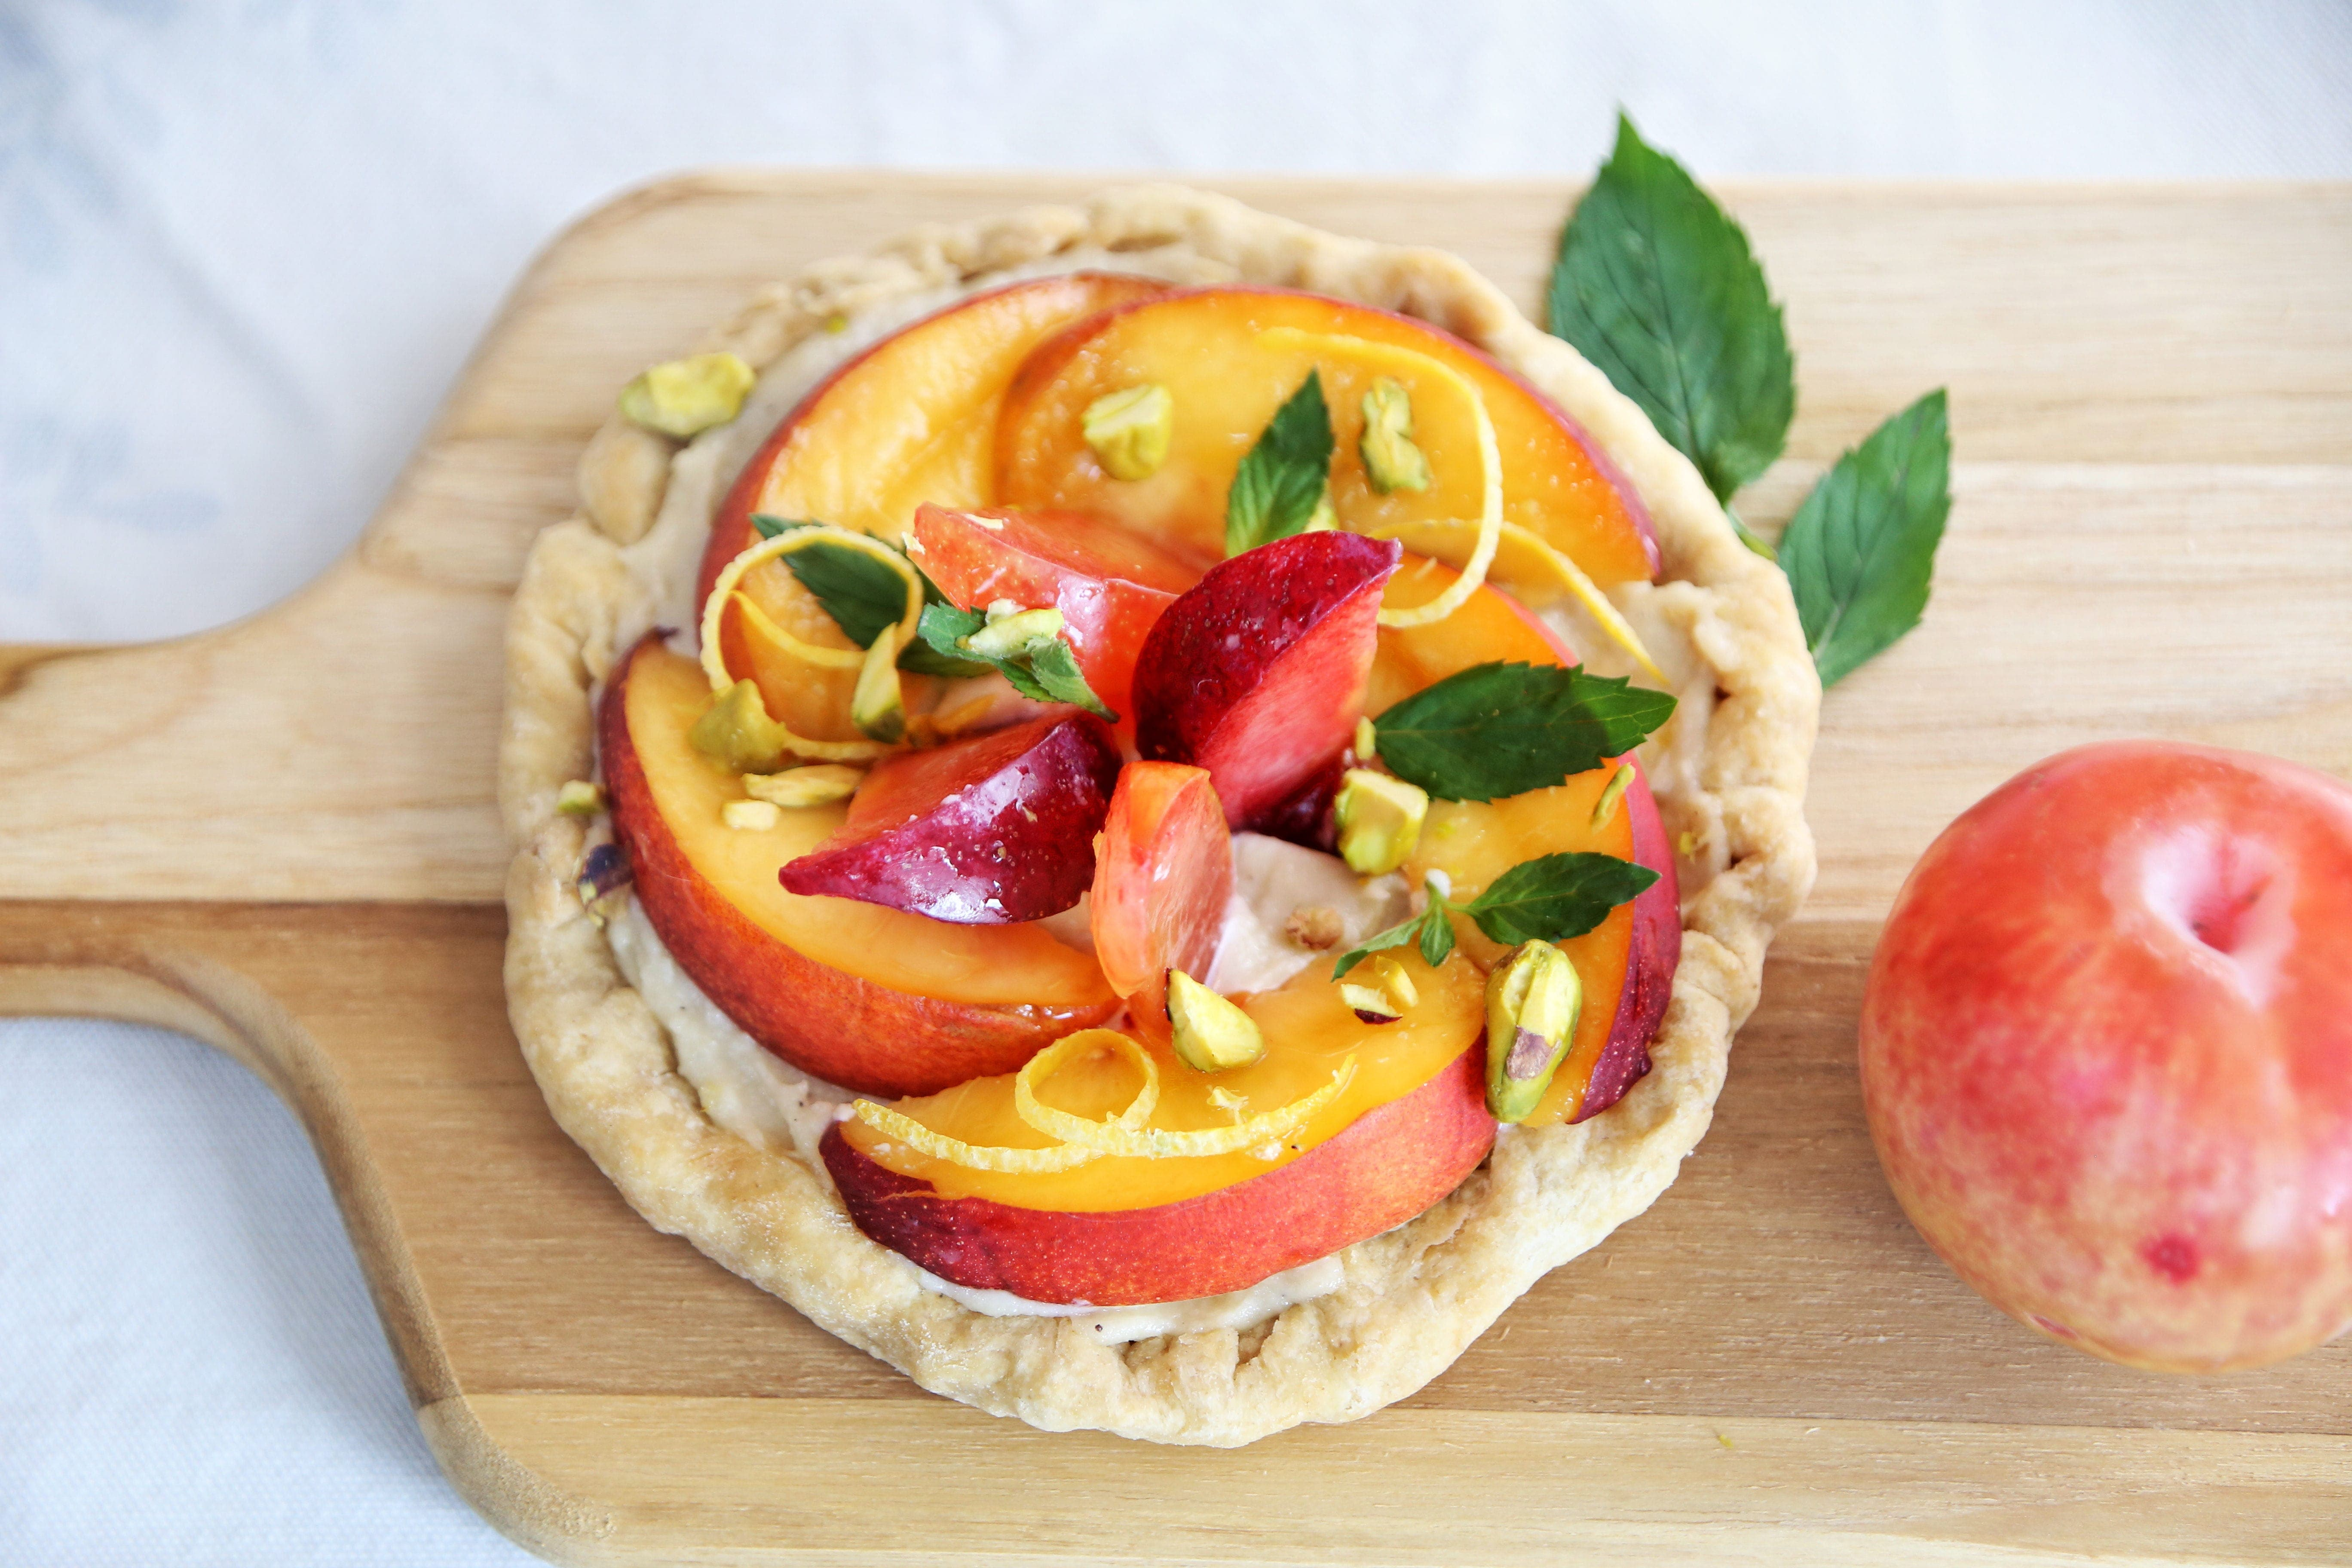 Sweet Nectarines top a Fresh Fruit Tart with Lemony Cream